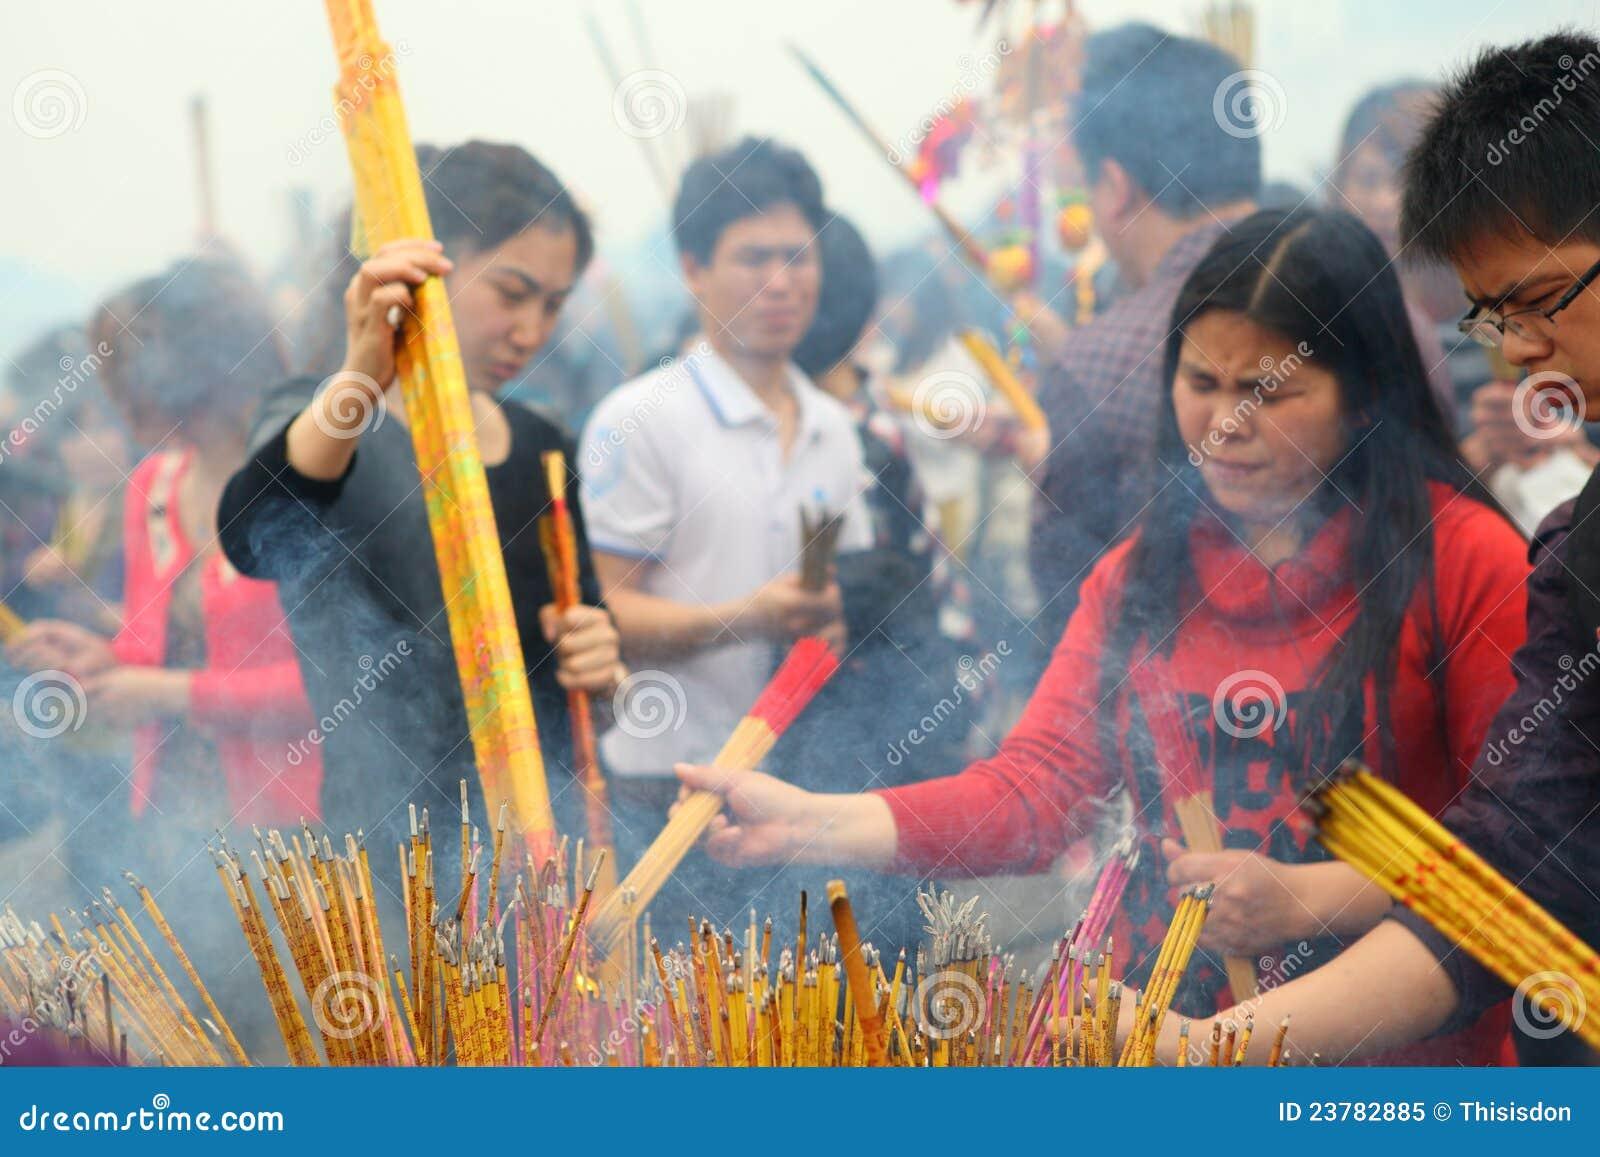 Prayer Burning Incense And Wish Good Luck Editorial Image